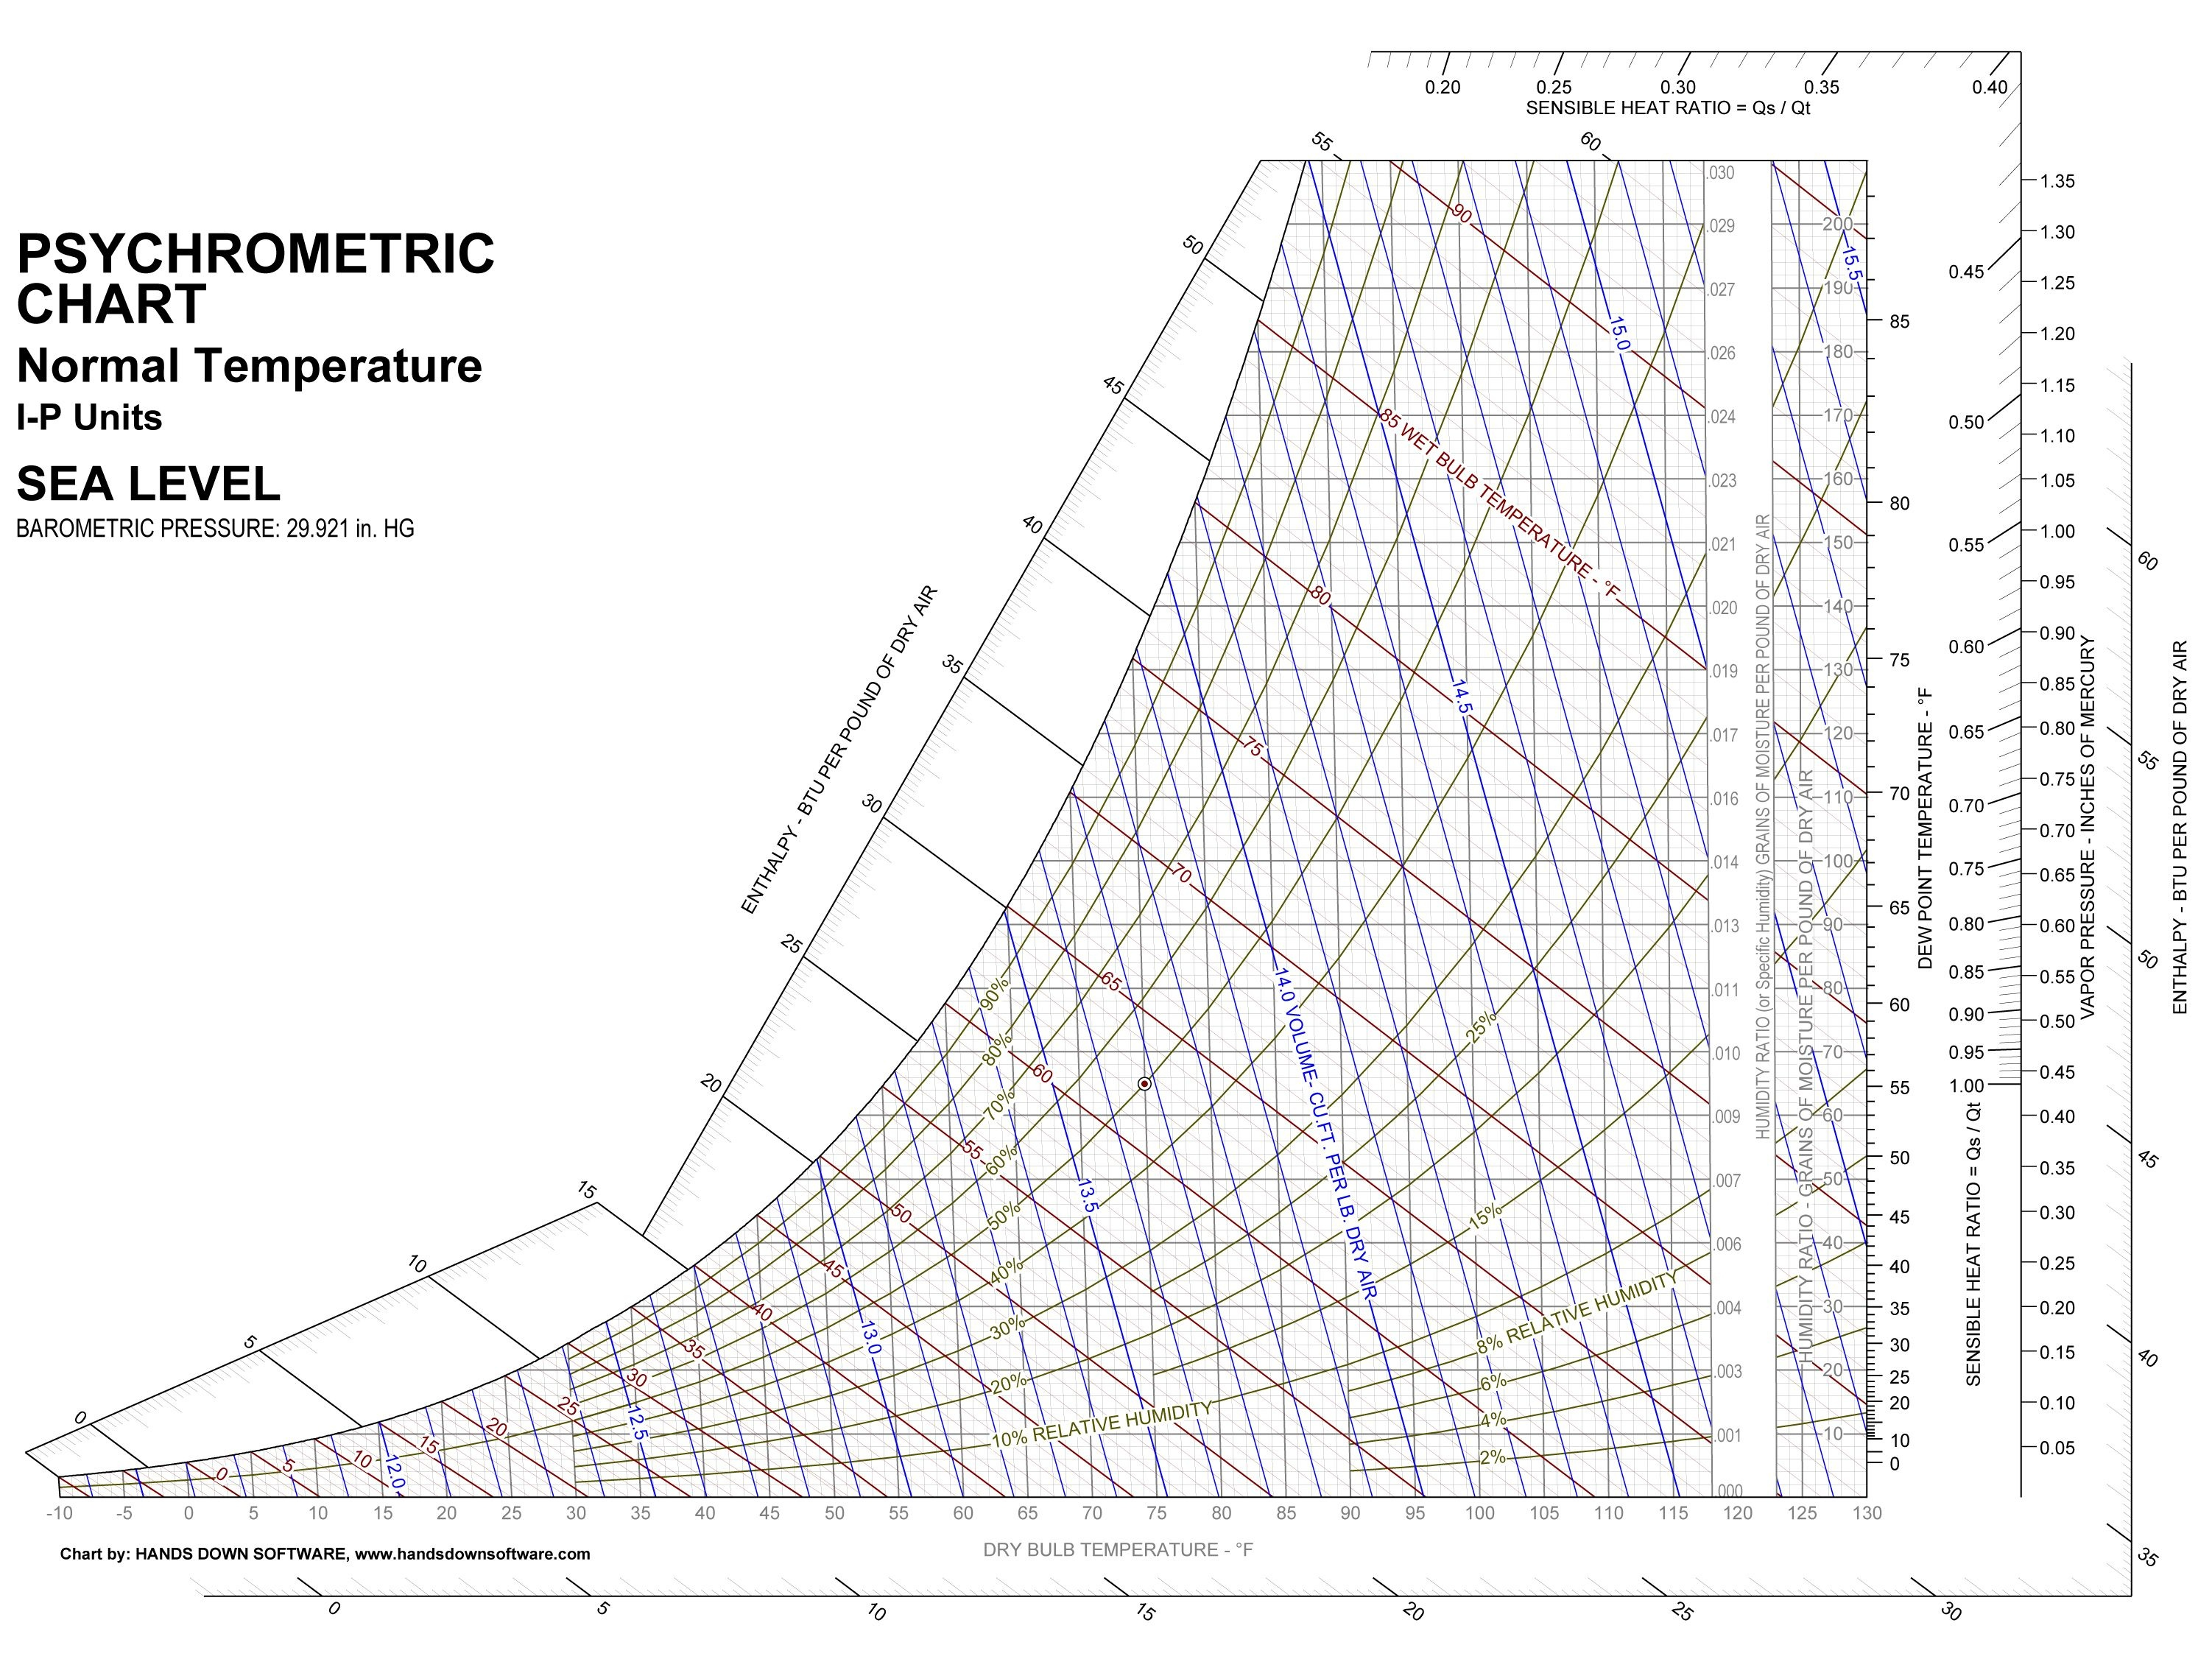 Printable Psychrometric Chart | งานสอน | Chart, Printables, Diy Tools - Printable Psychrometric Chart Free